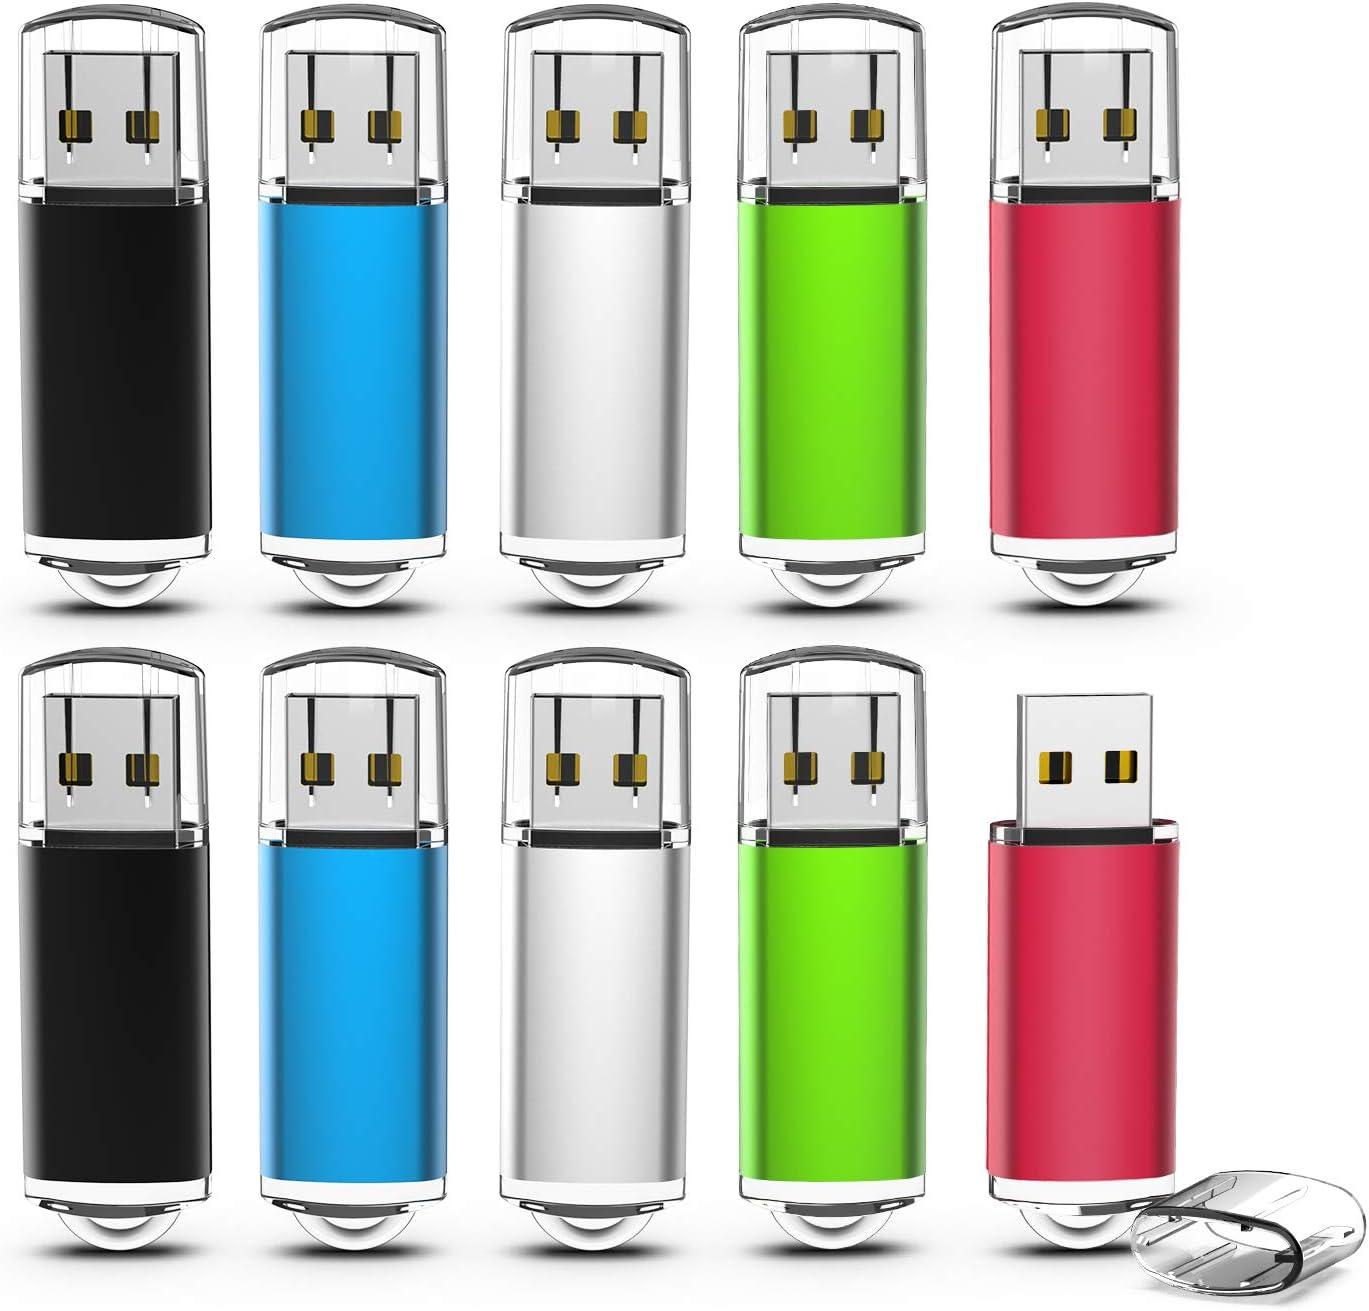 Memorias USB 4GB, TOPESEL Pendrives 10 Piezas USB 2.0 Stick Llave USB Flash Drive, Pack de 10 Unidades (5 Colores Negro Azul Plata Verde Rojo): Amazon.es: Informática